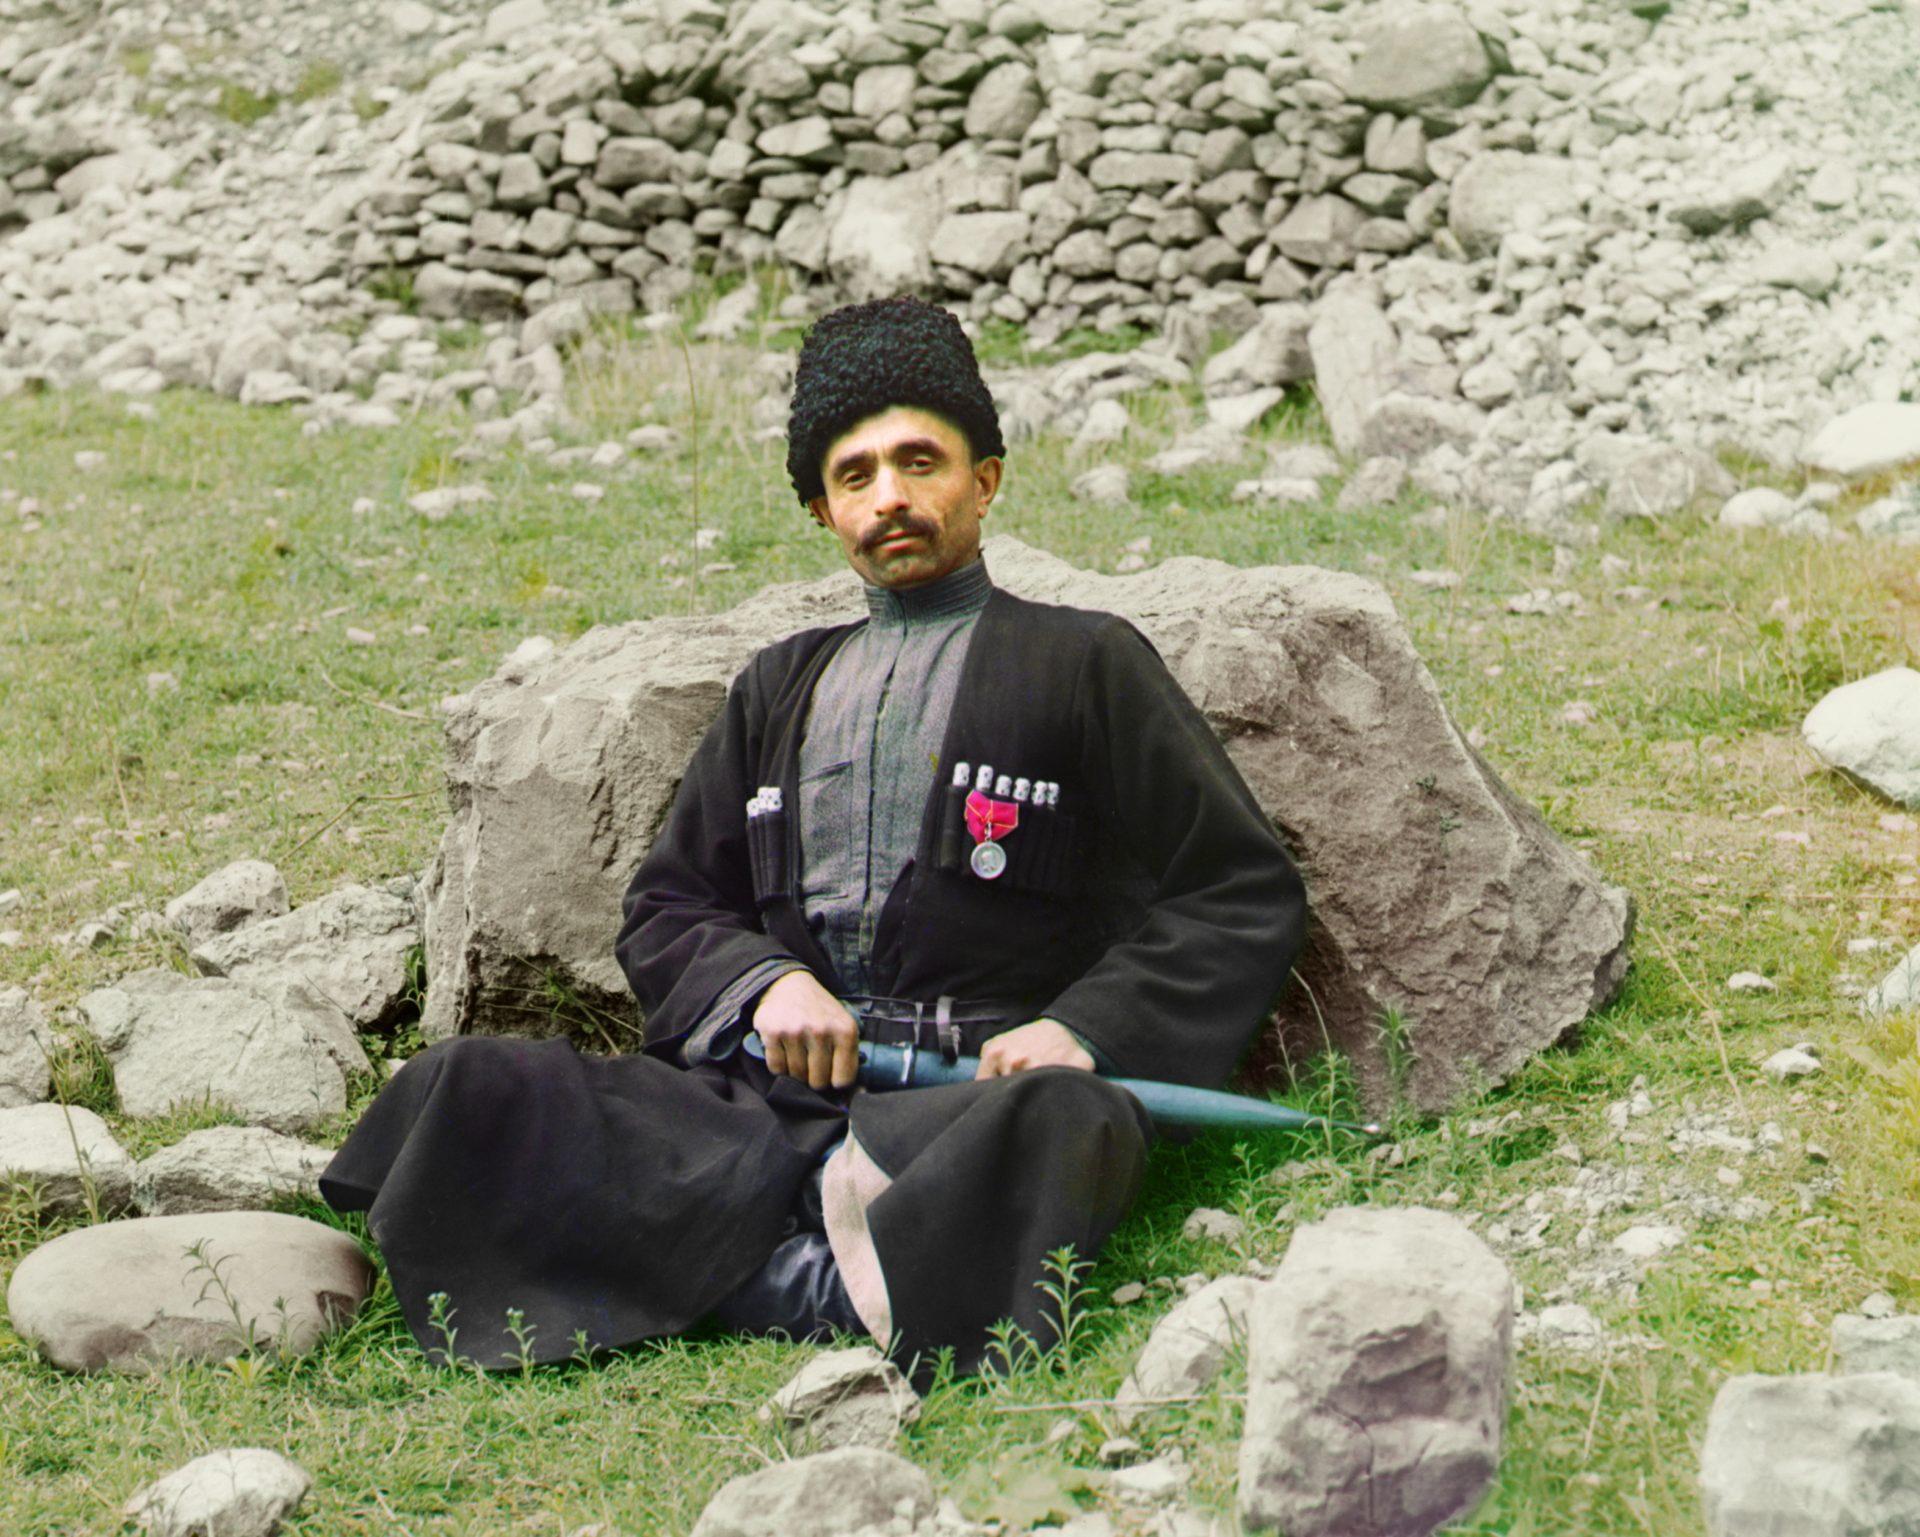 Dagestán 1904/S.Prokurin-Gorskij via Wikipedia